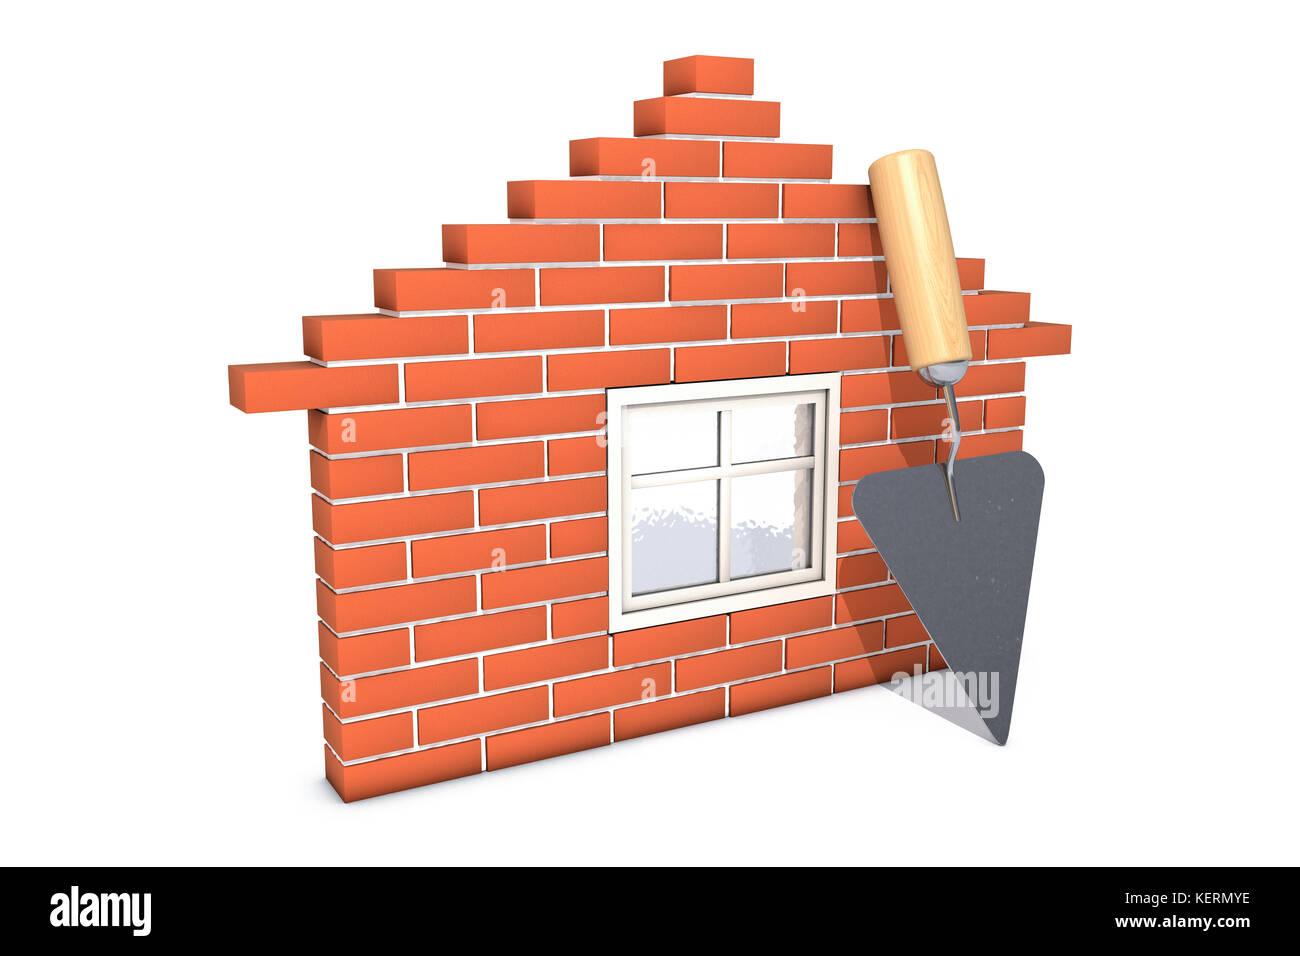 construction concept brick wall trowel stockfotos construction concept brick wall trowel. Black Bedroom Furniture Sets. Home Design Ideas